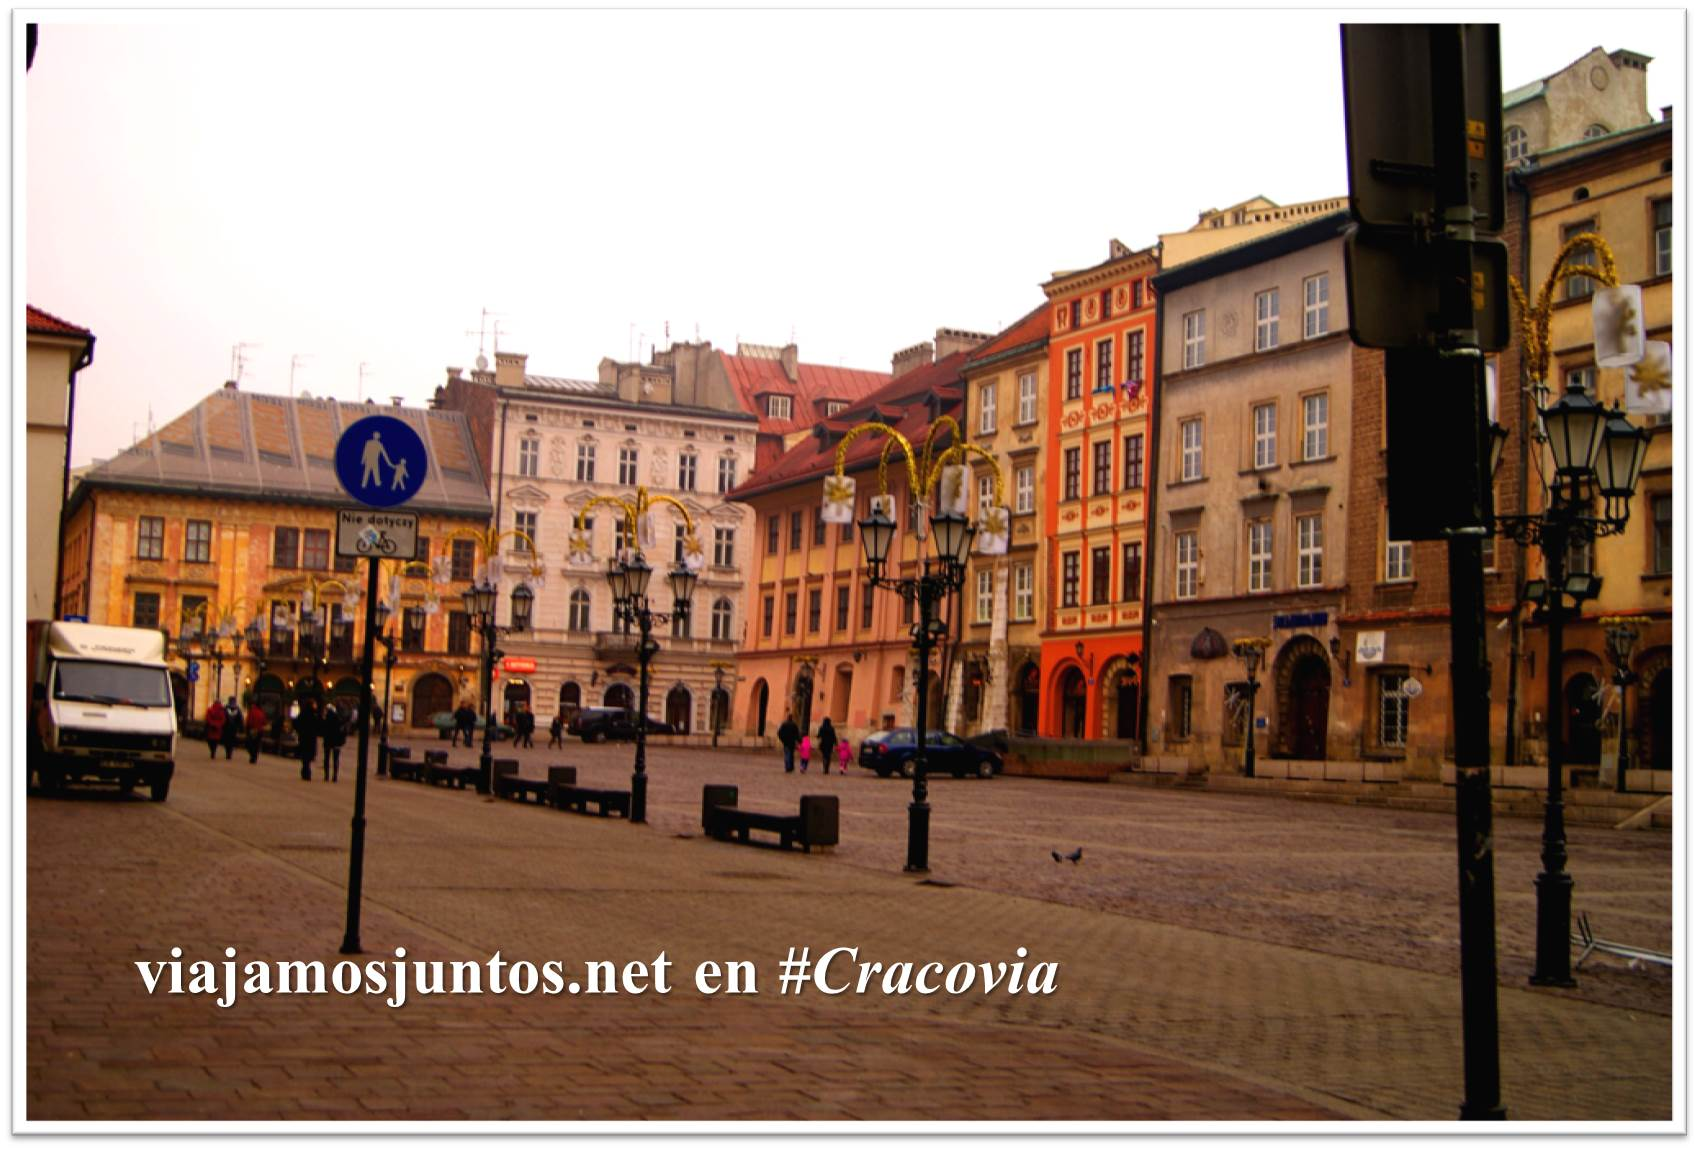 La calle Grodska, donde está el hostal Good-bye Lenin. Cracovia, Polonia